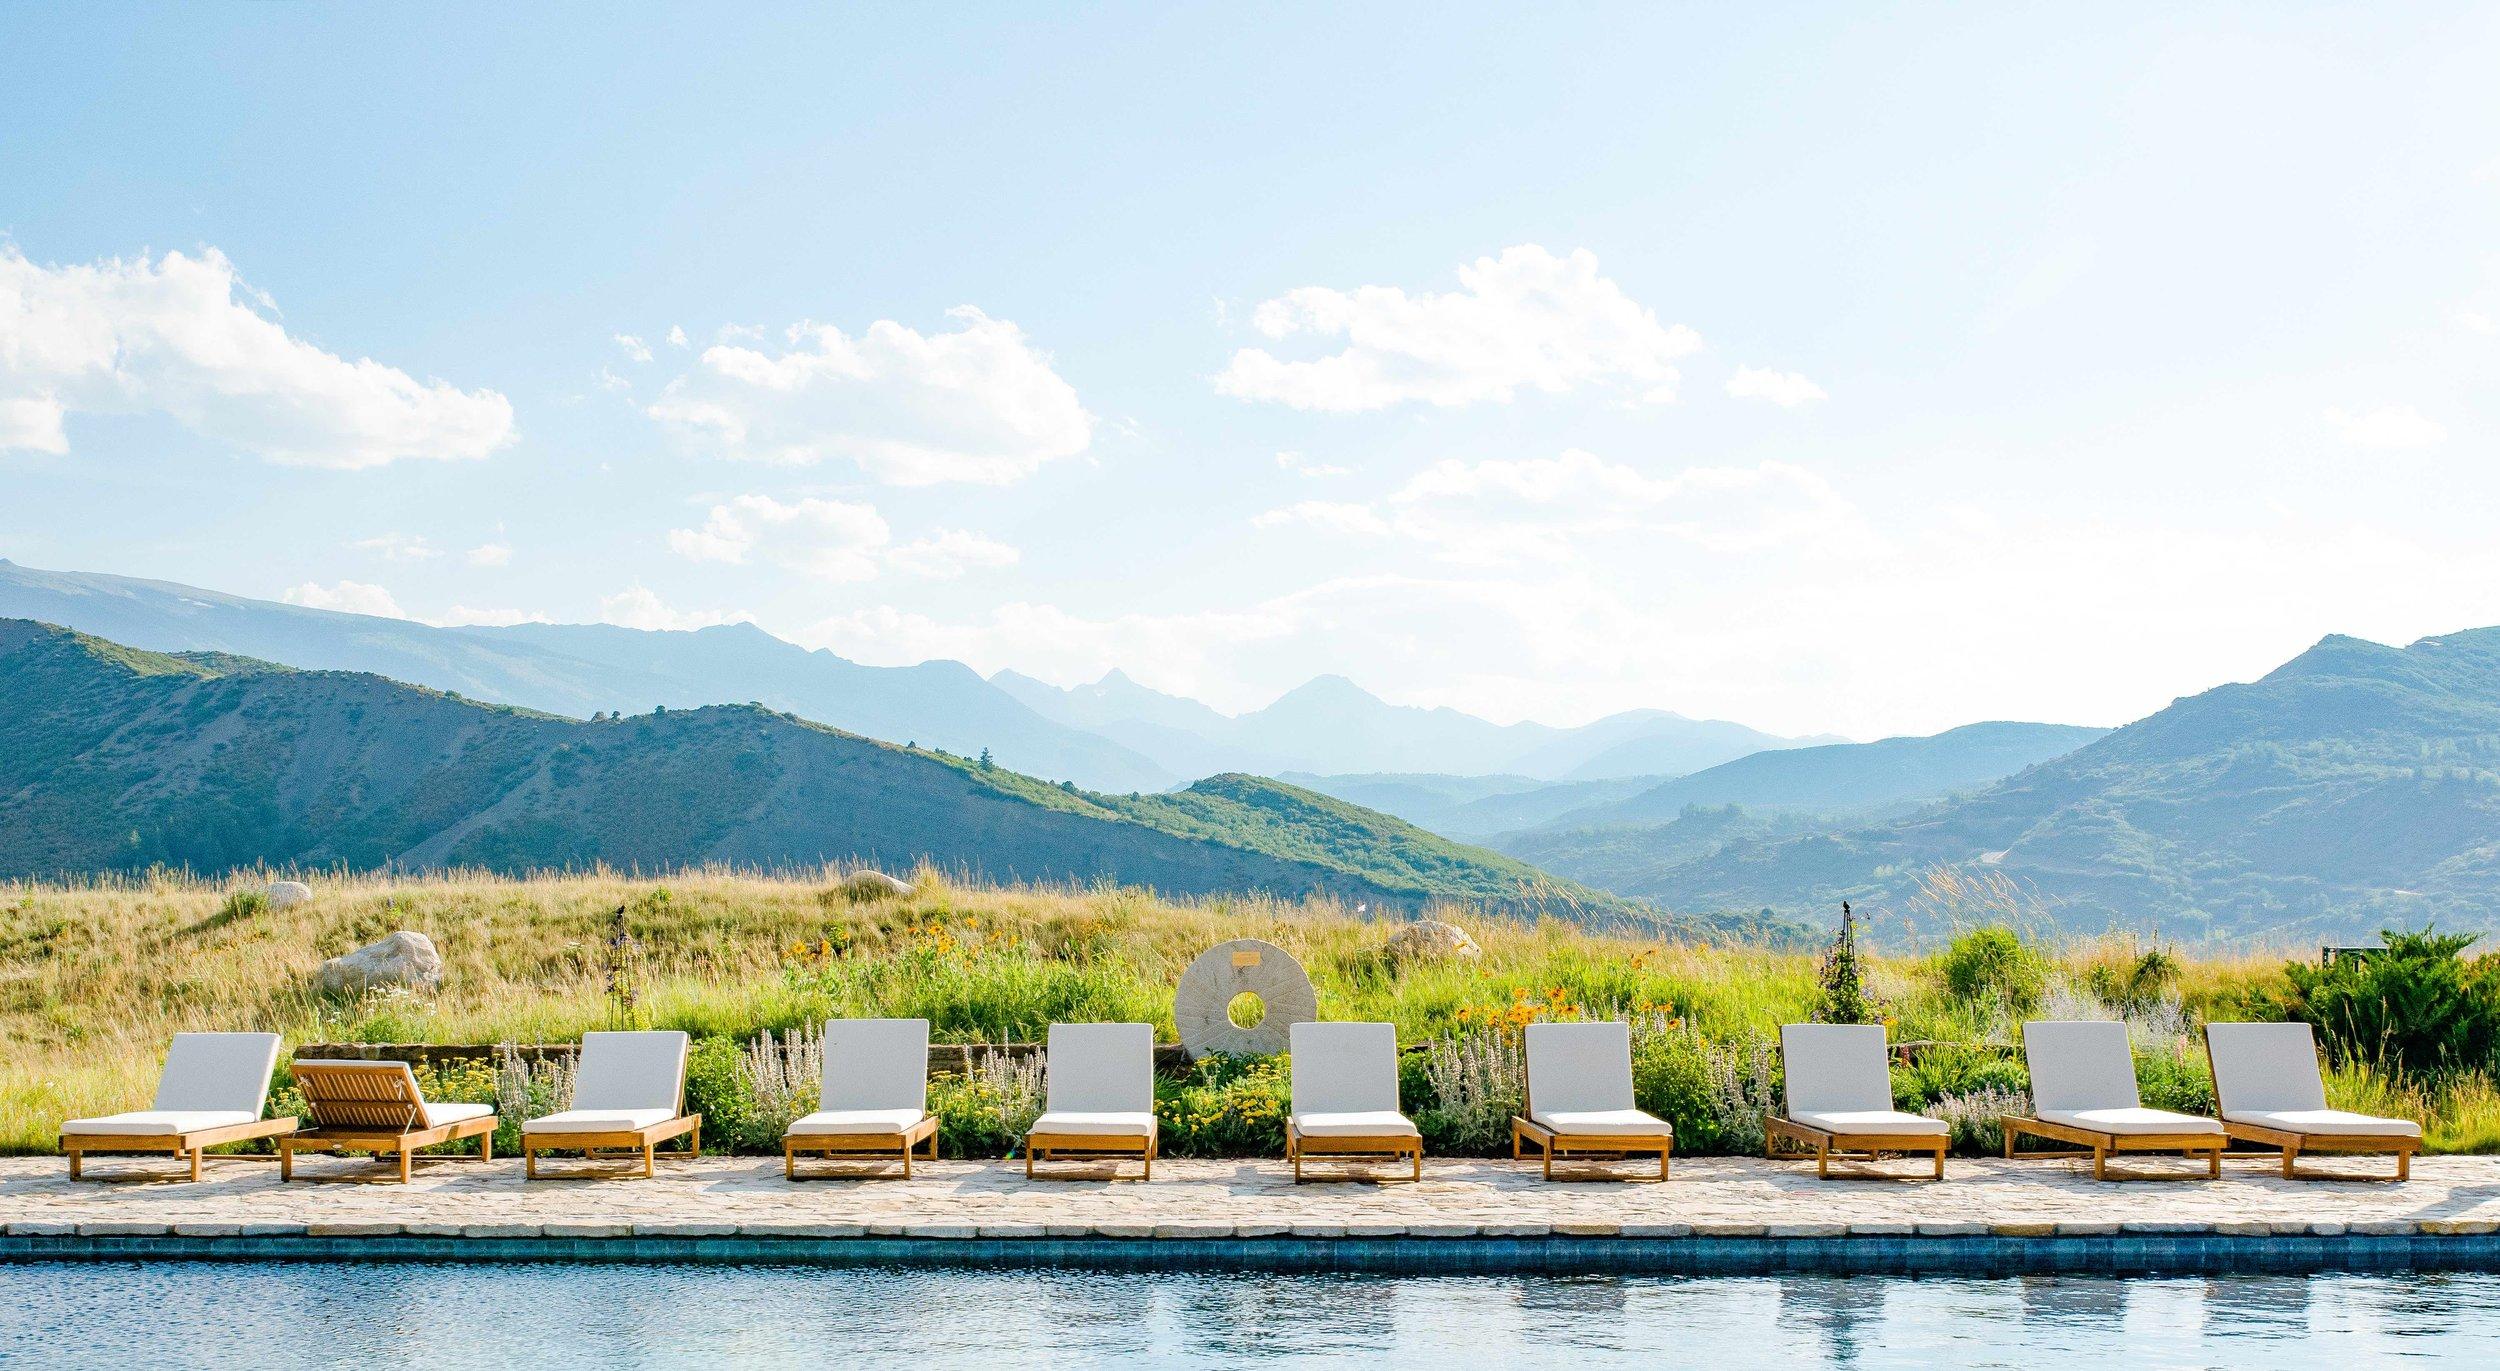 Resort Landscape Architecture